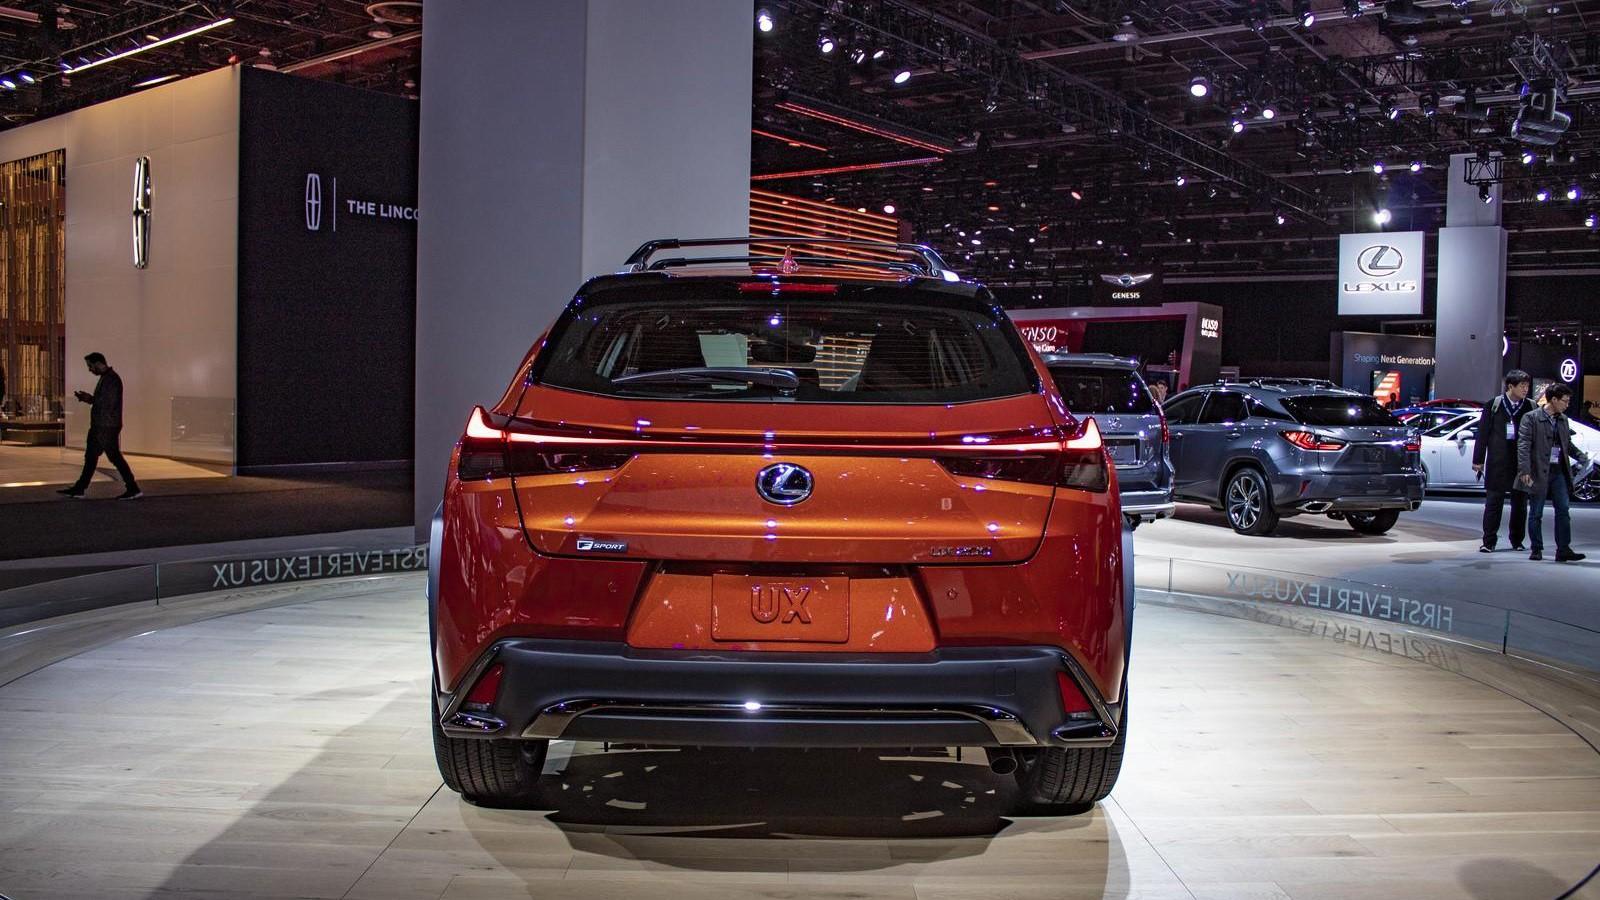 Novyj Lexus UX 2019 jekster'er, vneshnij vid, vid szadi, obzor, foto, tehnicheskie harakteristiki